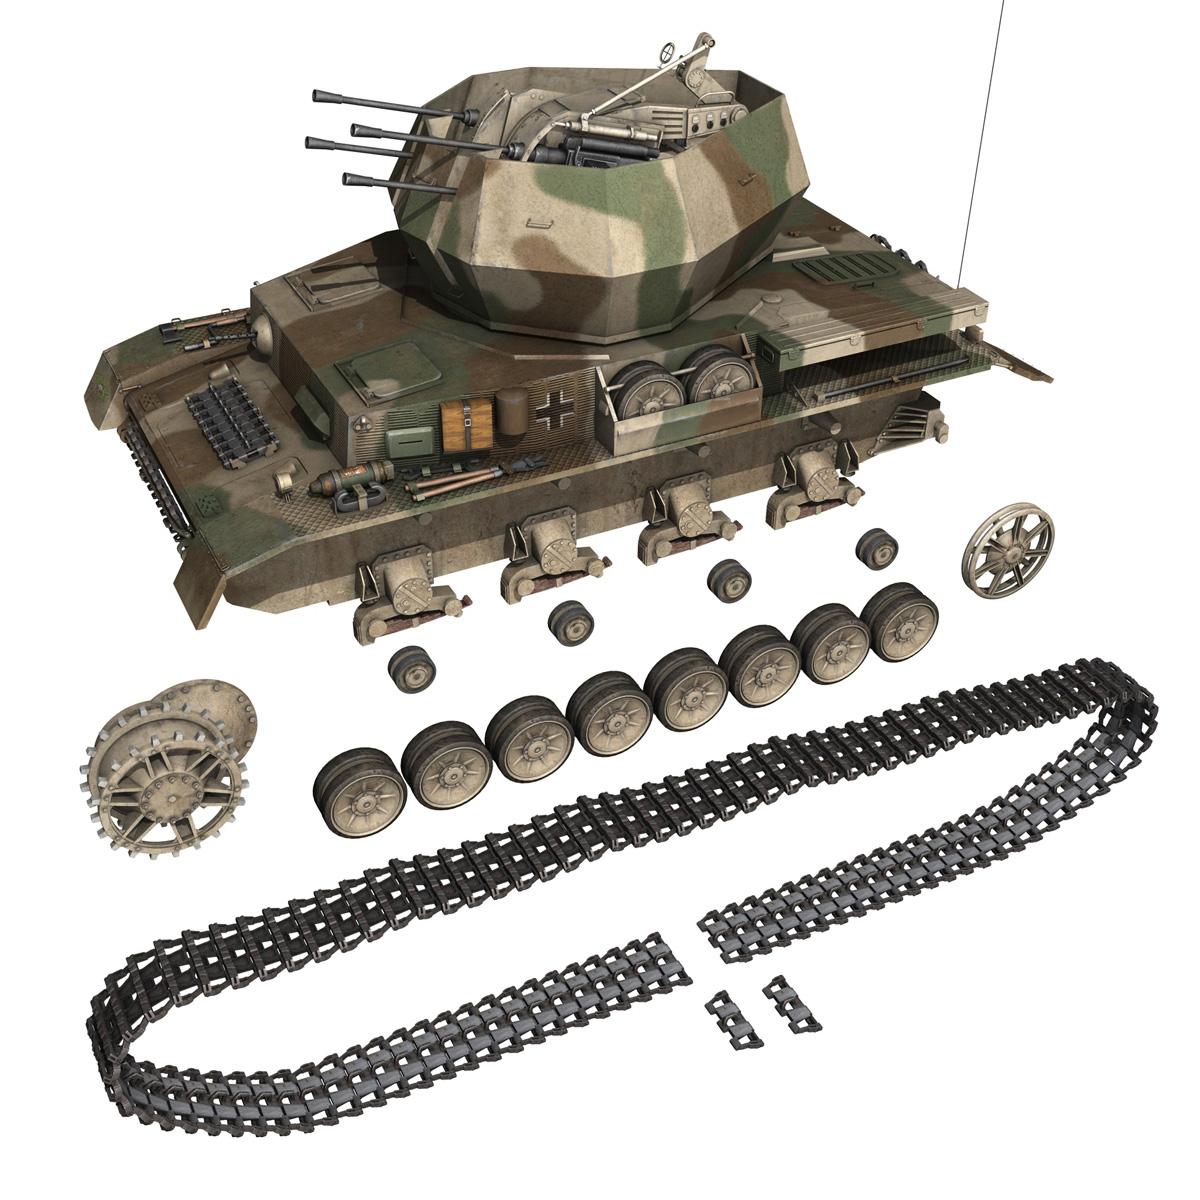 flakpanzer iv – wirbelwind – spzjgabt 654 3d model 3ds fbx c4d lwo obj 282315